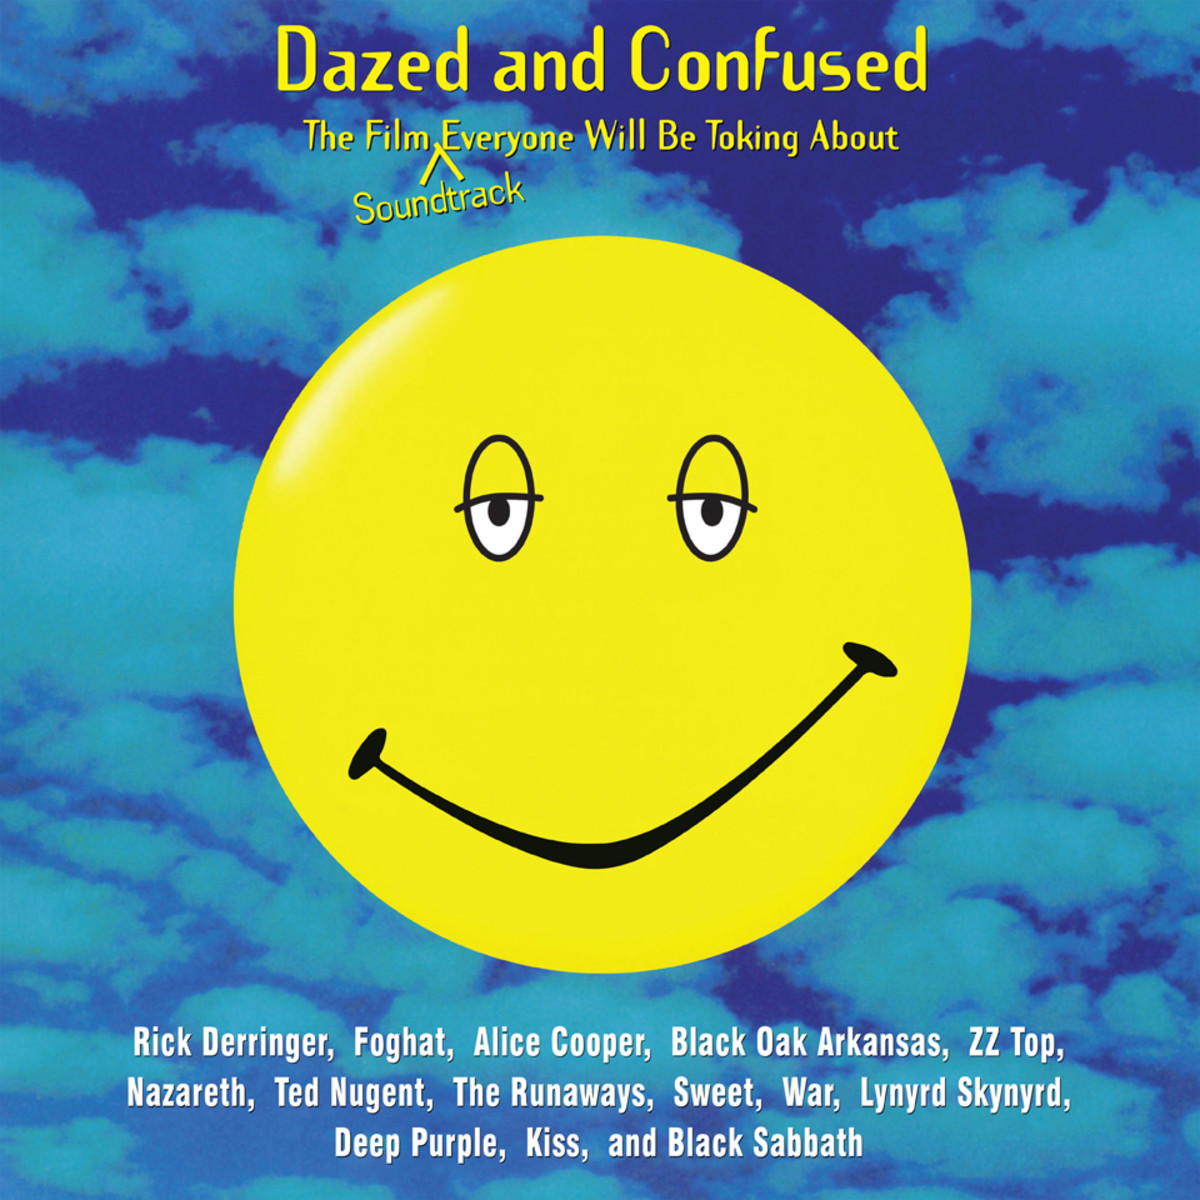 DazedAndConfused_Cover